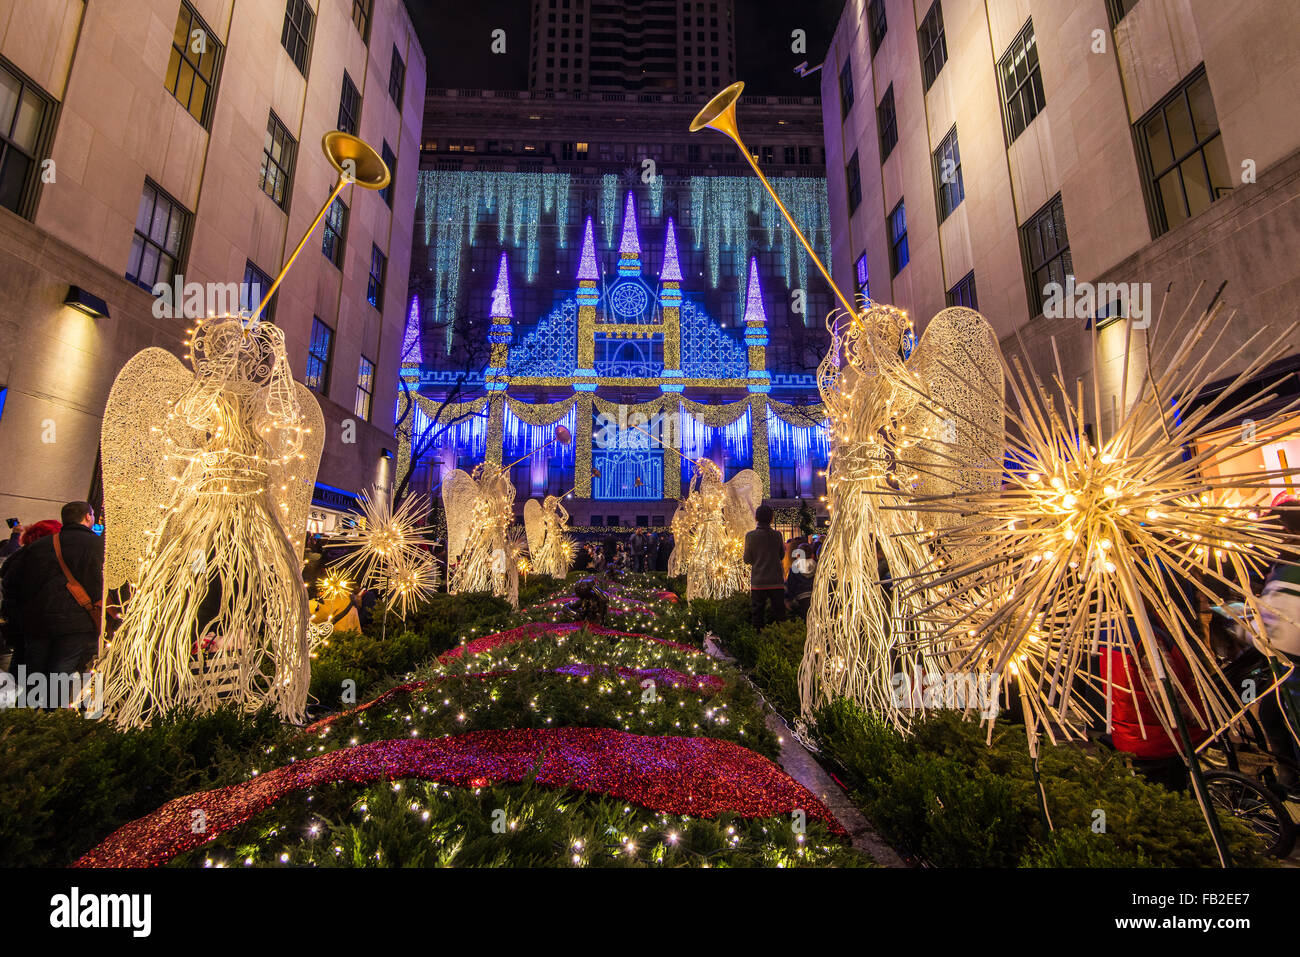 Ángeles de Navidad en el Rockefeller Center Channel Gardens con Saks department store's Christmas show Imagen De Stock